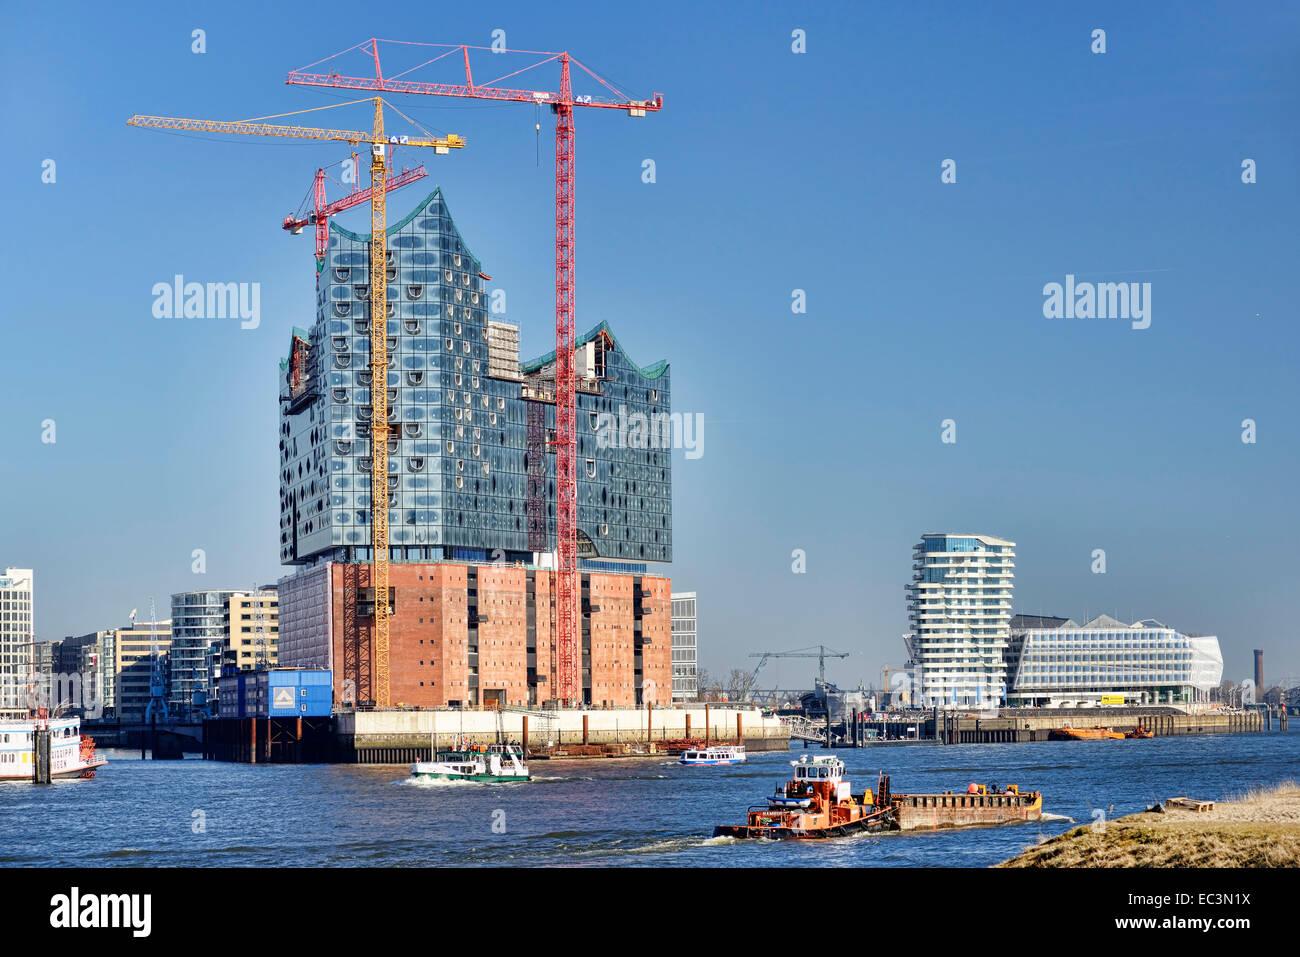 Elbphilharmonie building in Hamburg, Germany - Stock Image